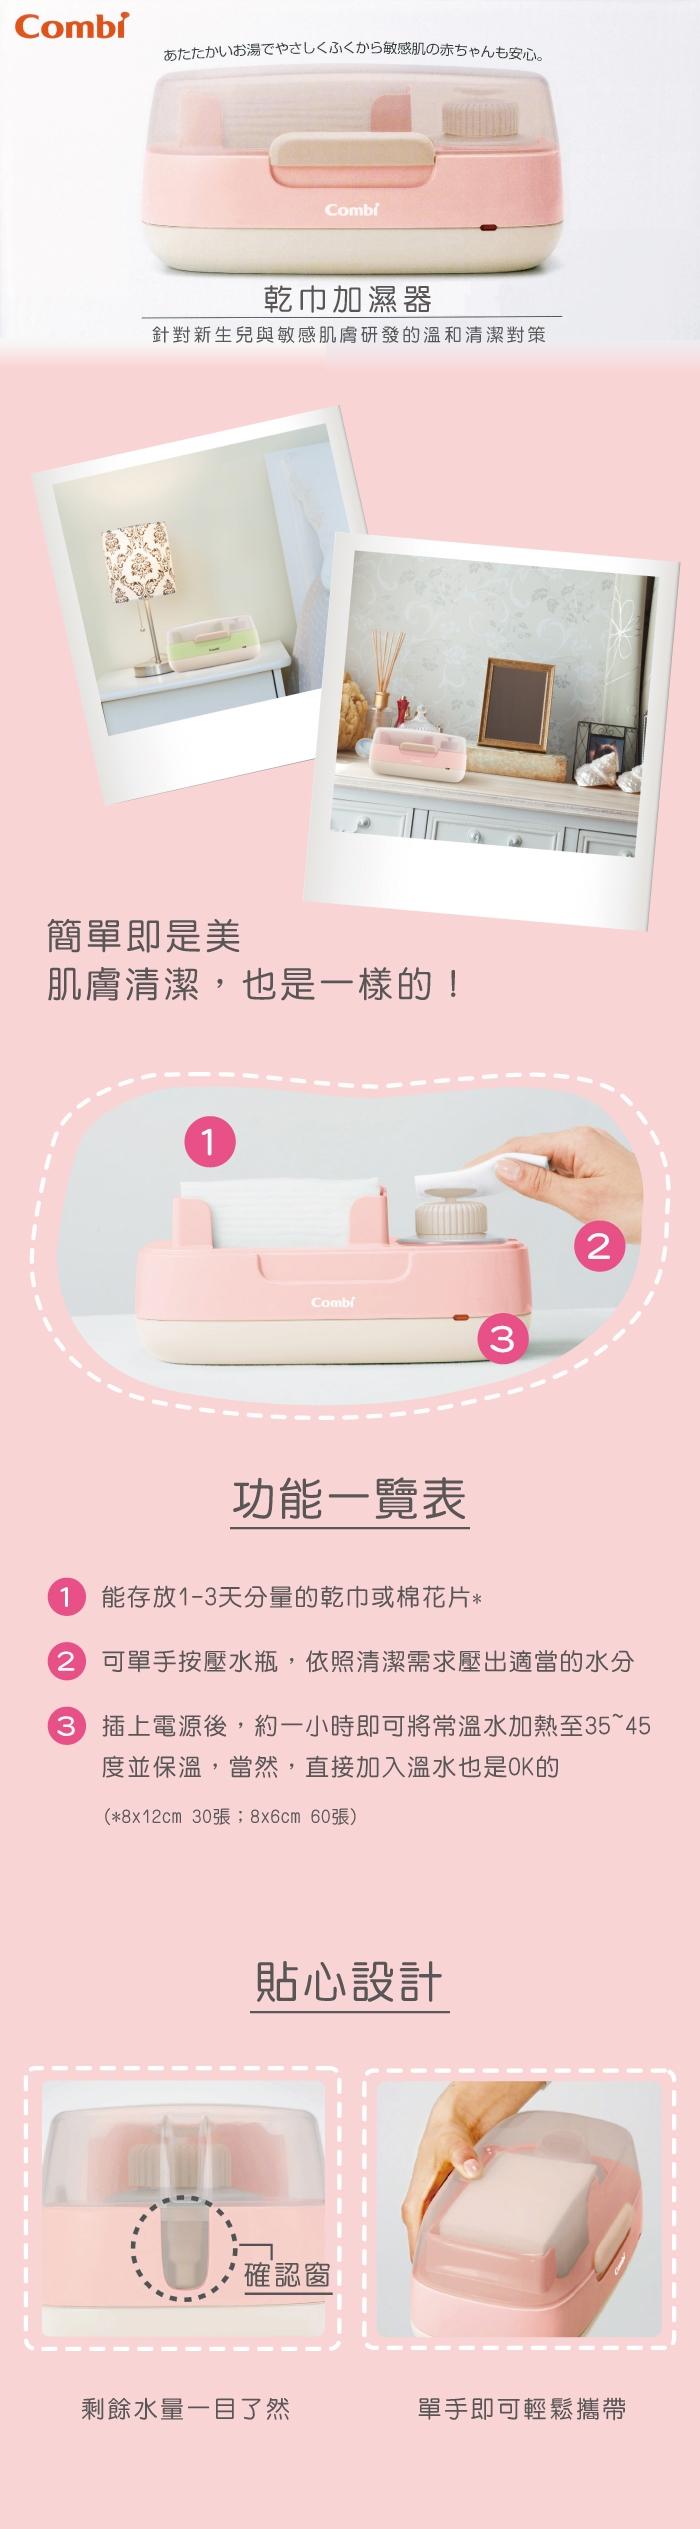 combi 康貝 乾式紙巾加濕器 (共2色可選)